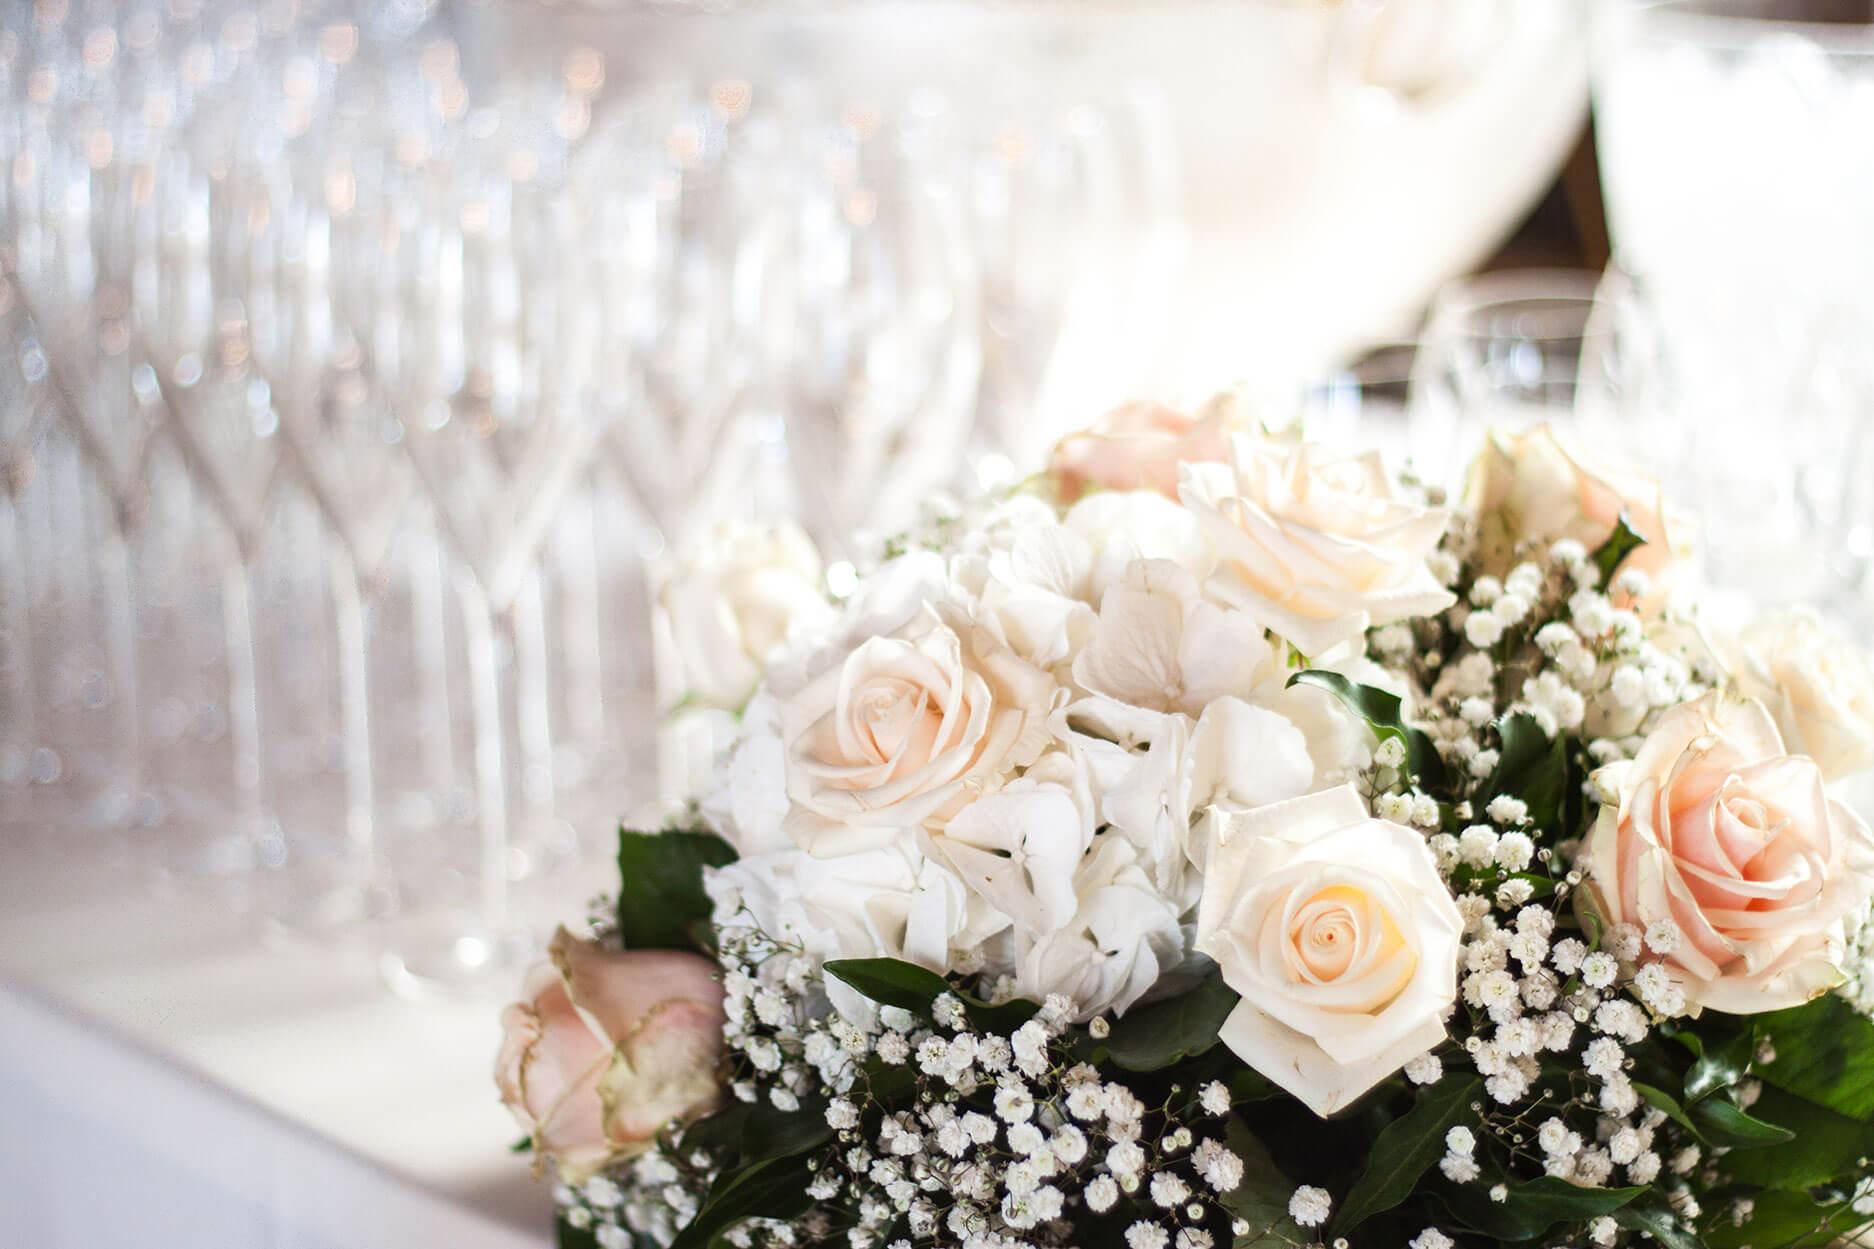 Francesca-Ferrati-wedding-photographer-Verona-Svetlana-Gianluigi4